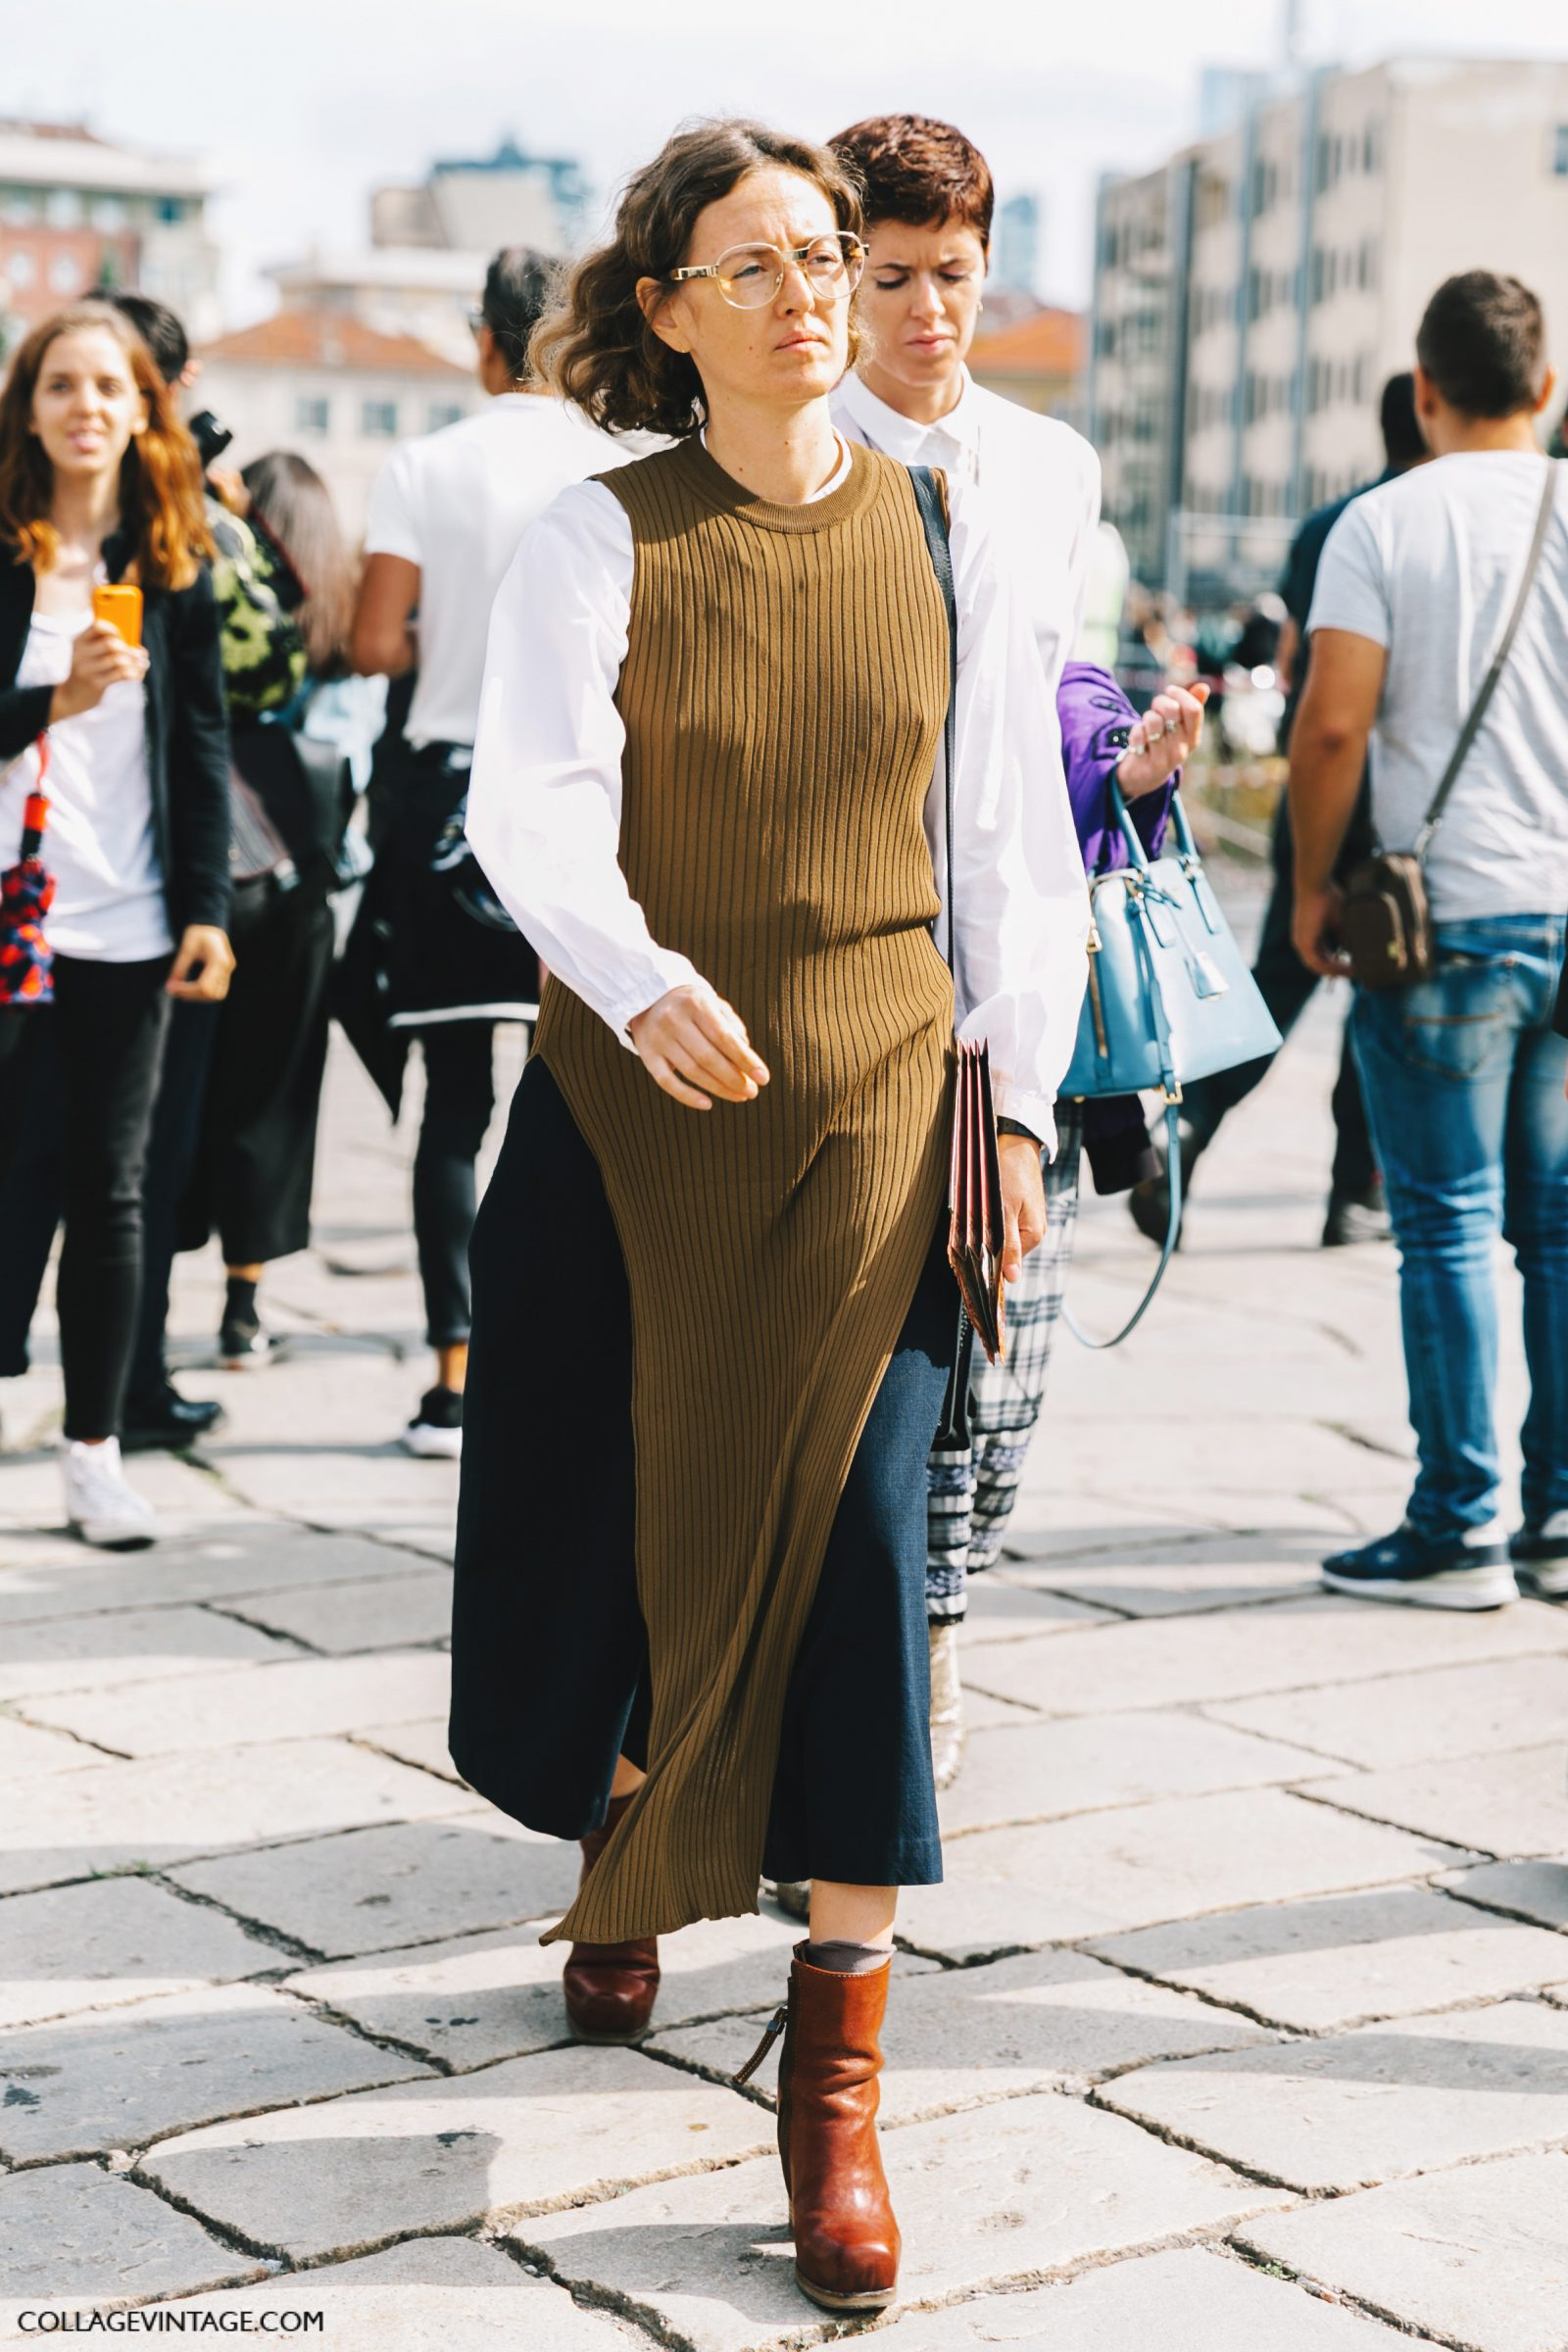 mfw-milan_fashion_week_ss17-street_style-outfits-collage_vintage-gucci-numero_21-alberta_ferreti-77